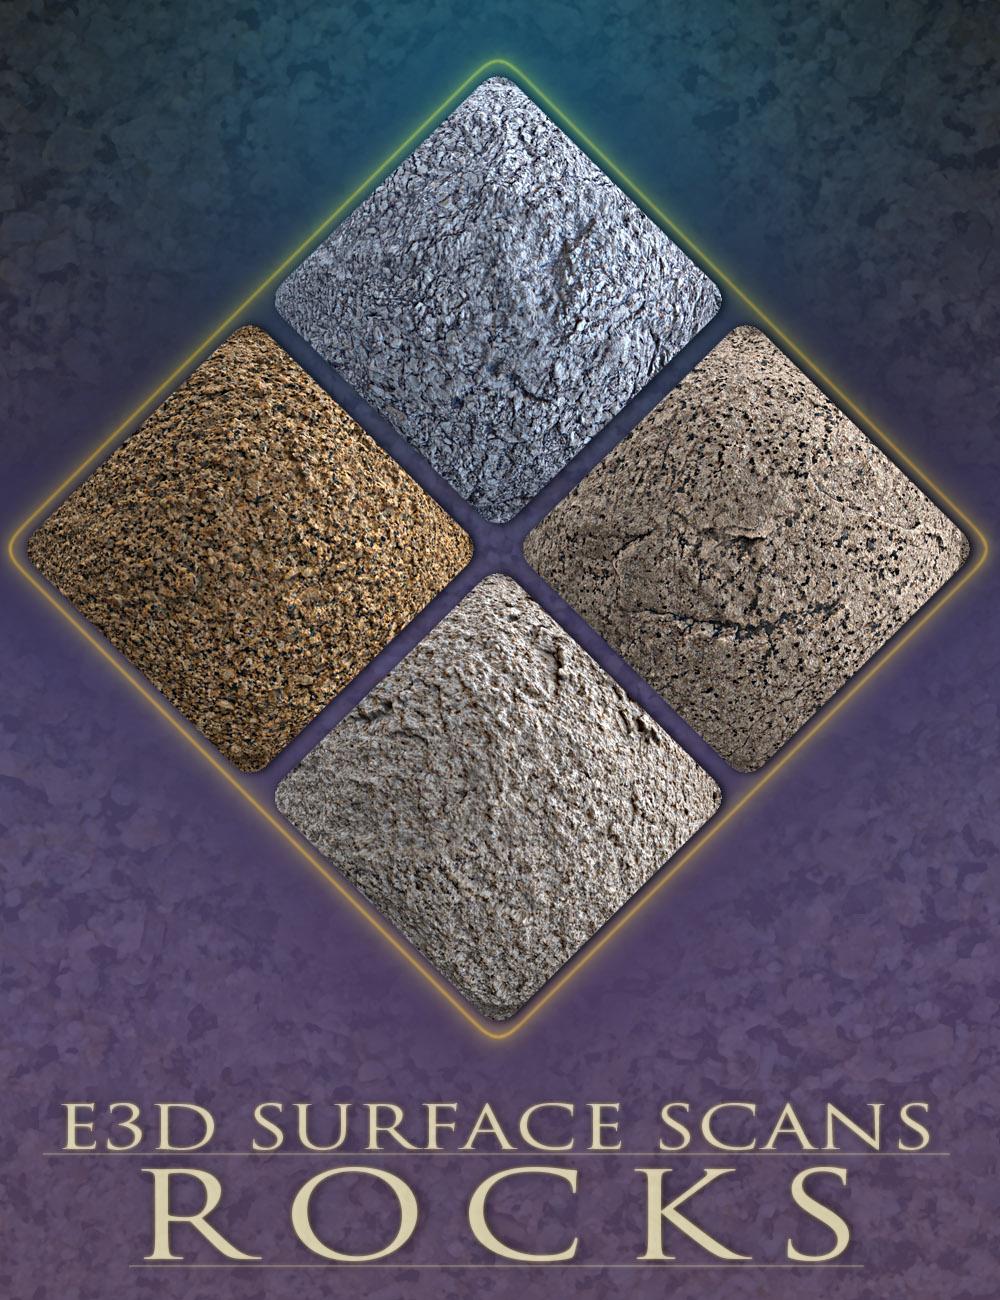 E3D Surface Scans - Rock Textures and Merchant Resource by: EcoManiac3D, 3D Models by Daz 3D